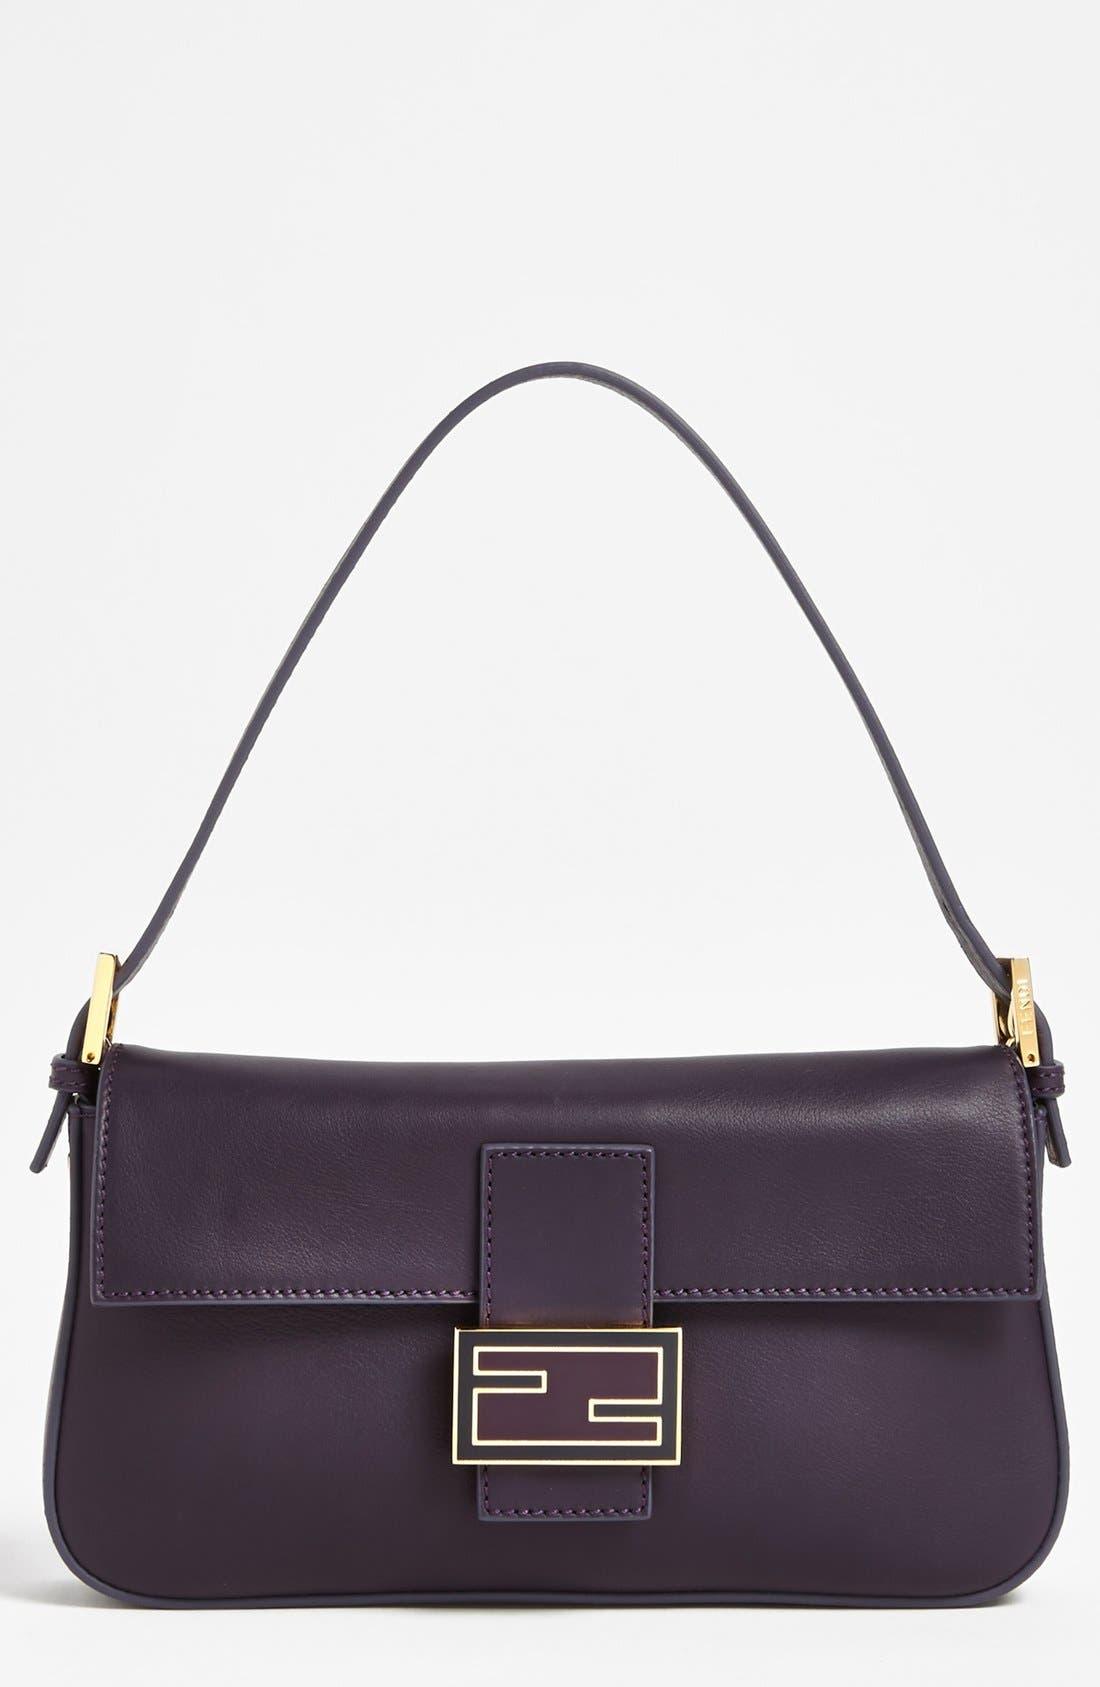 Alternate Image 1 Selected - Fendi Leather Baguette